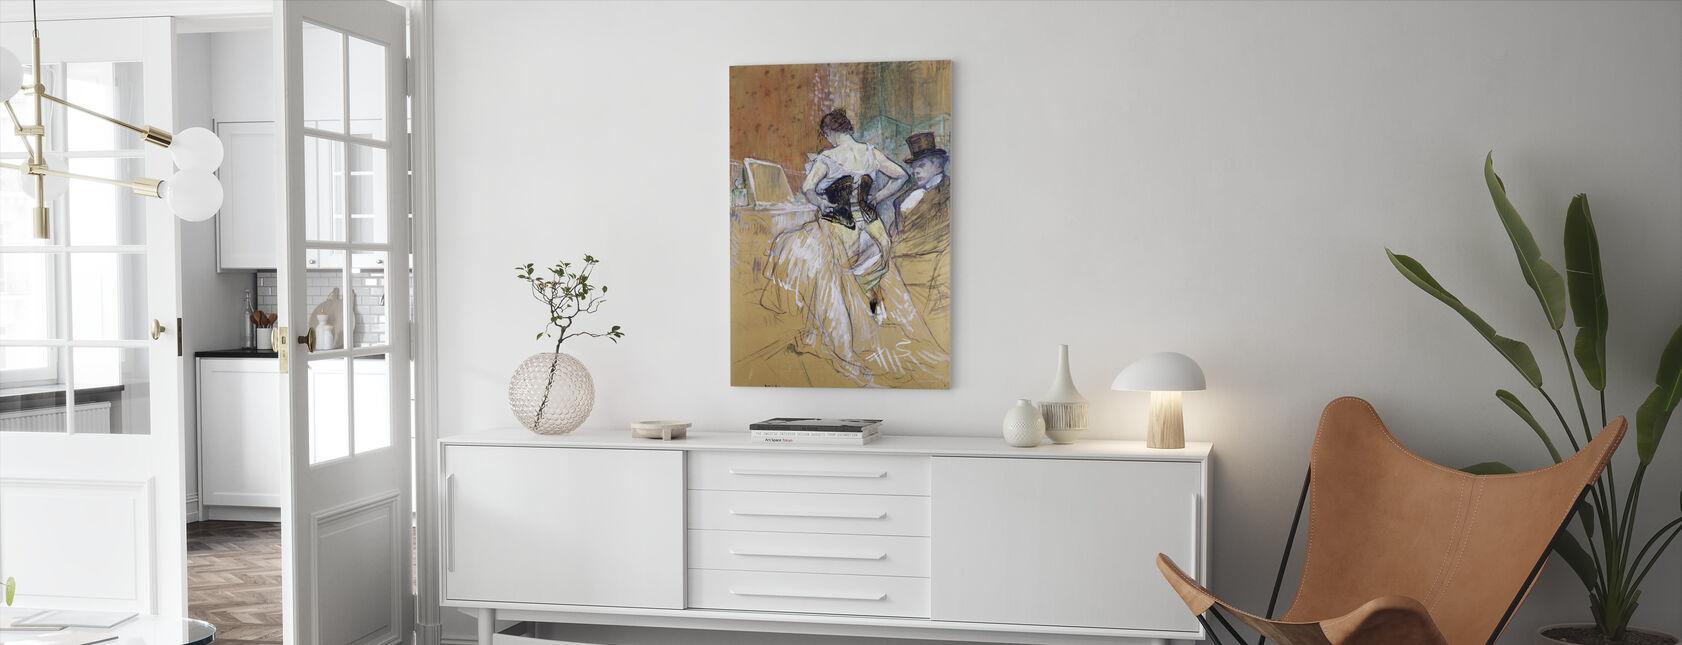 Vrouwen op haar toilet, Henri Toulouse Lautrec - Canvas print - Woonkamer